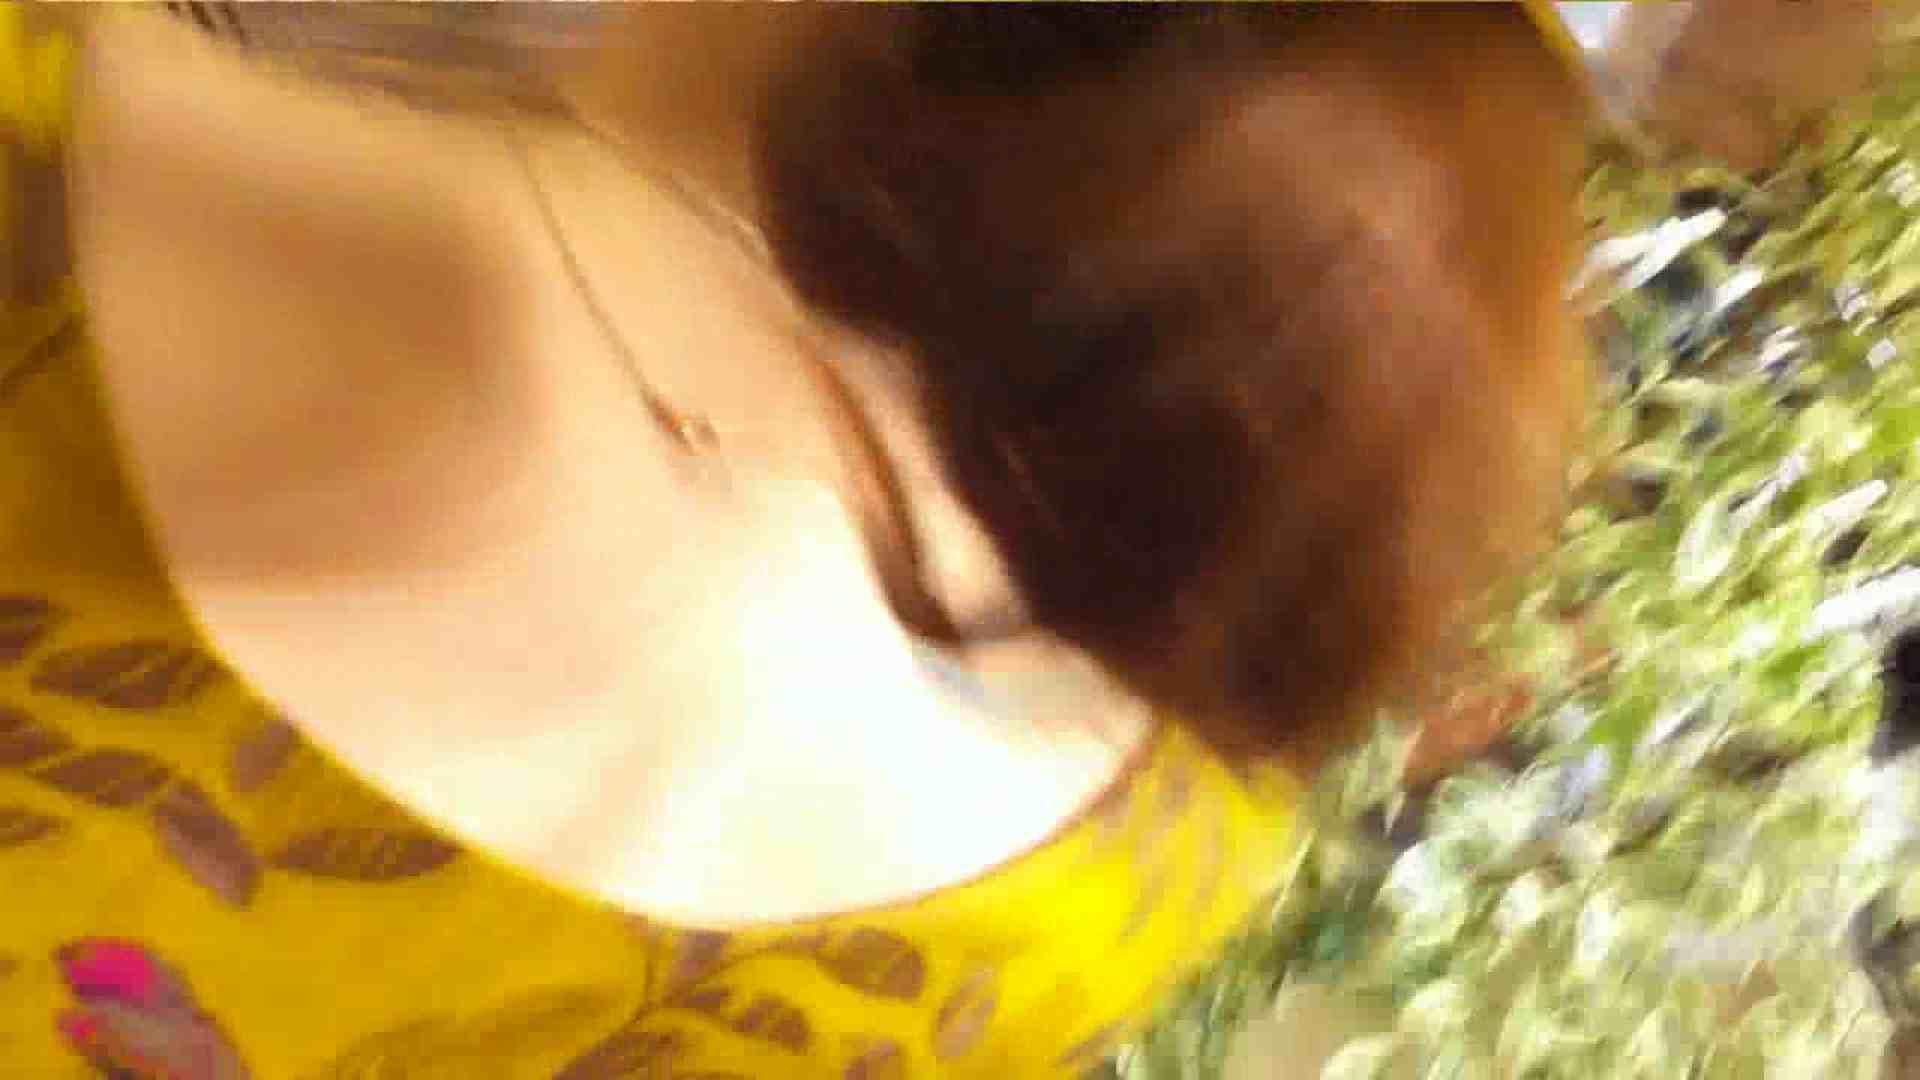 vol.39 美人アパレル胸チラ&パンチラ おねーさんのスカートにモグリたい! パンチラ 盗撮動画紹介 108枚 64